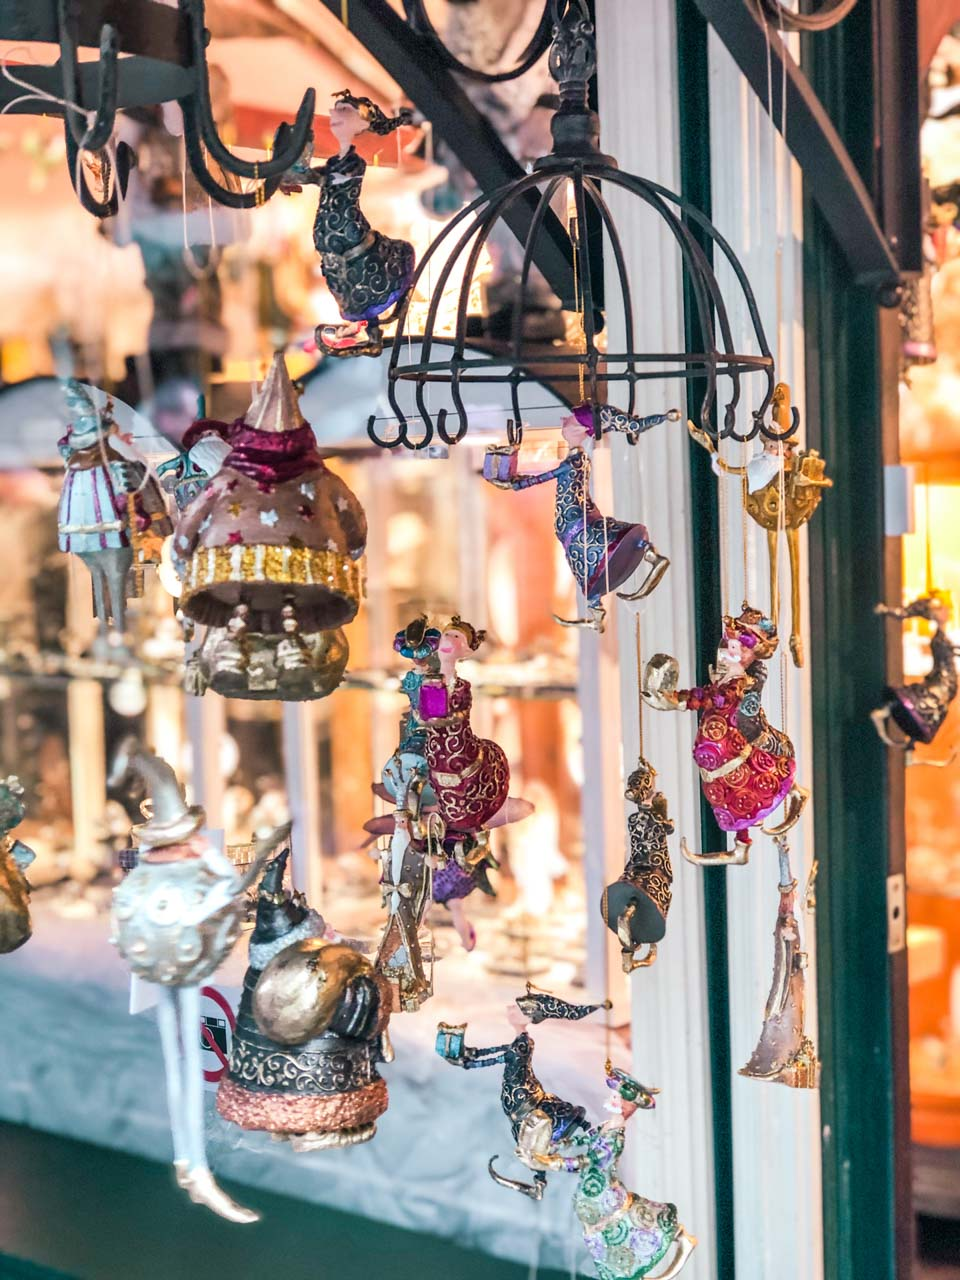 Handmade Christmas ornaments at the City Hall Christmas Market in Hamburg